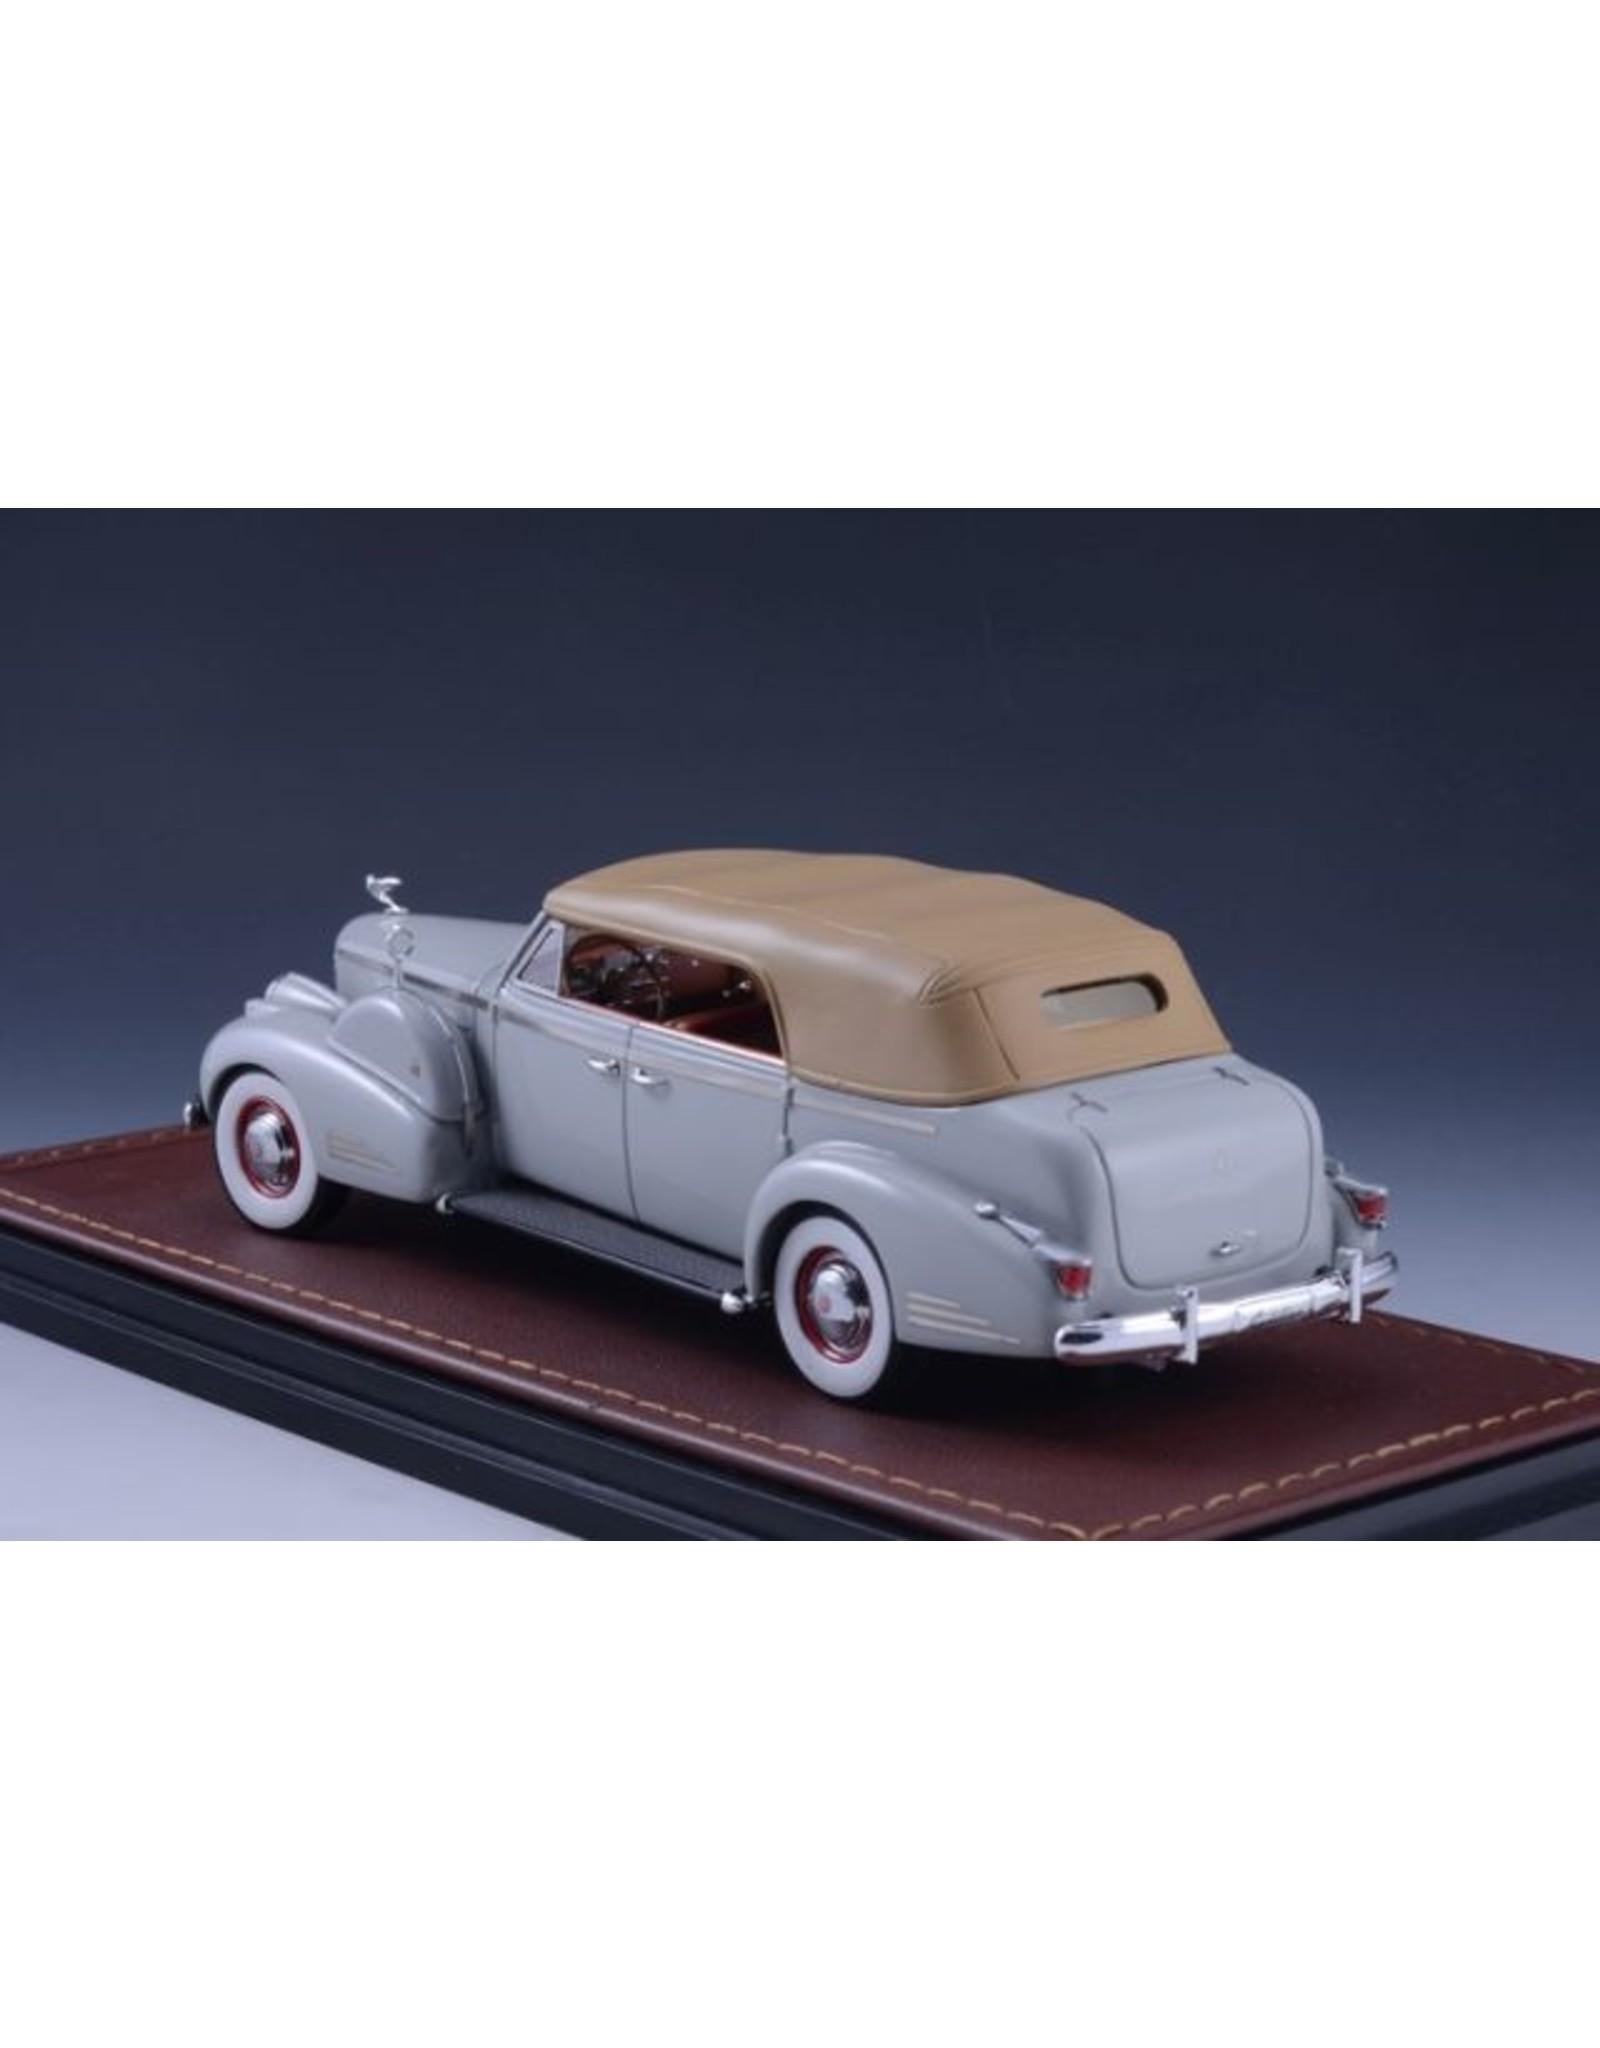 Cadillac(General Motors) CADILLAC V16 SERIES 90 FLEETWOOD SEDAN CONVERTIBLE-1938(grey)closed top.